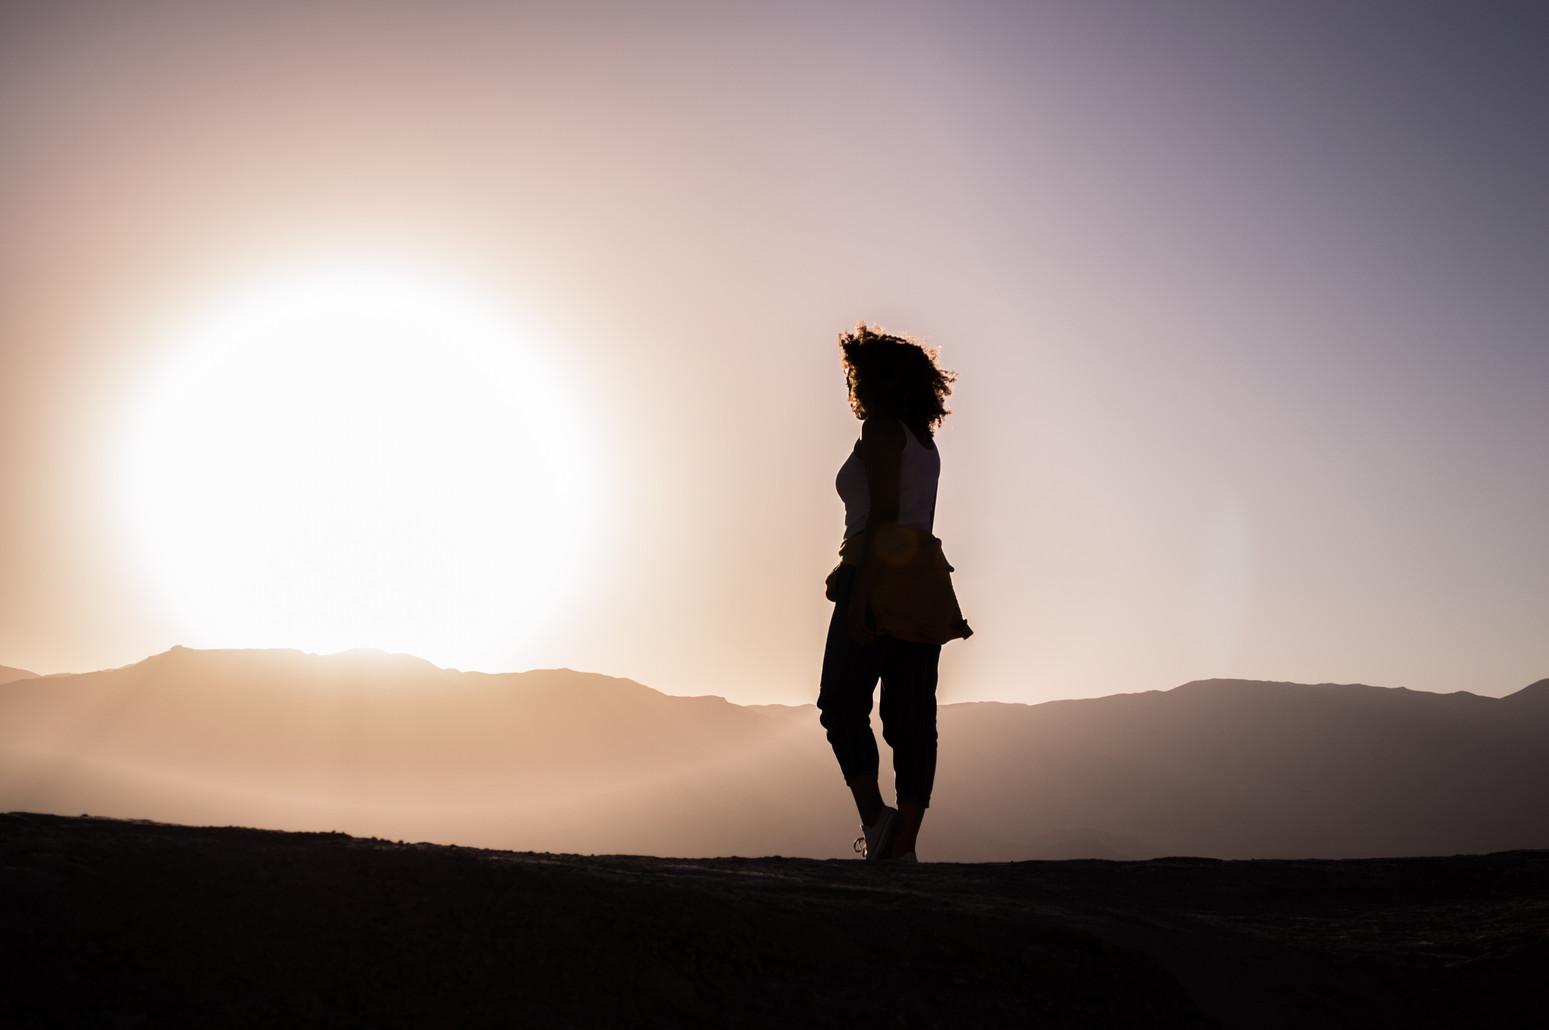 Walking into the horizon.